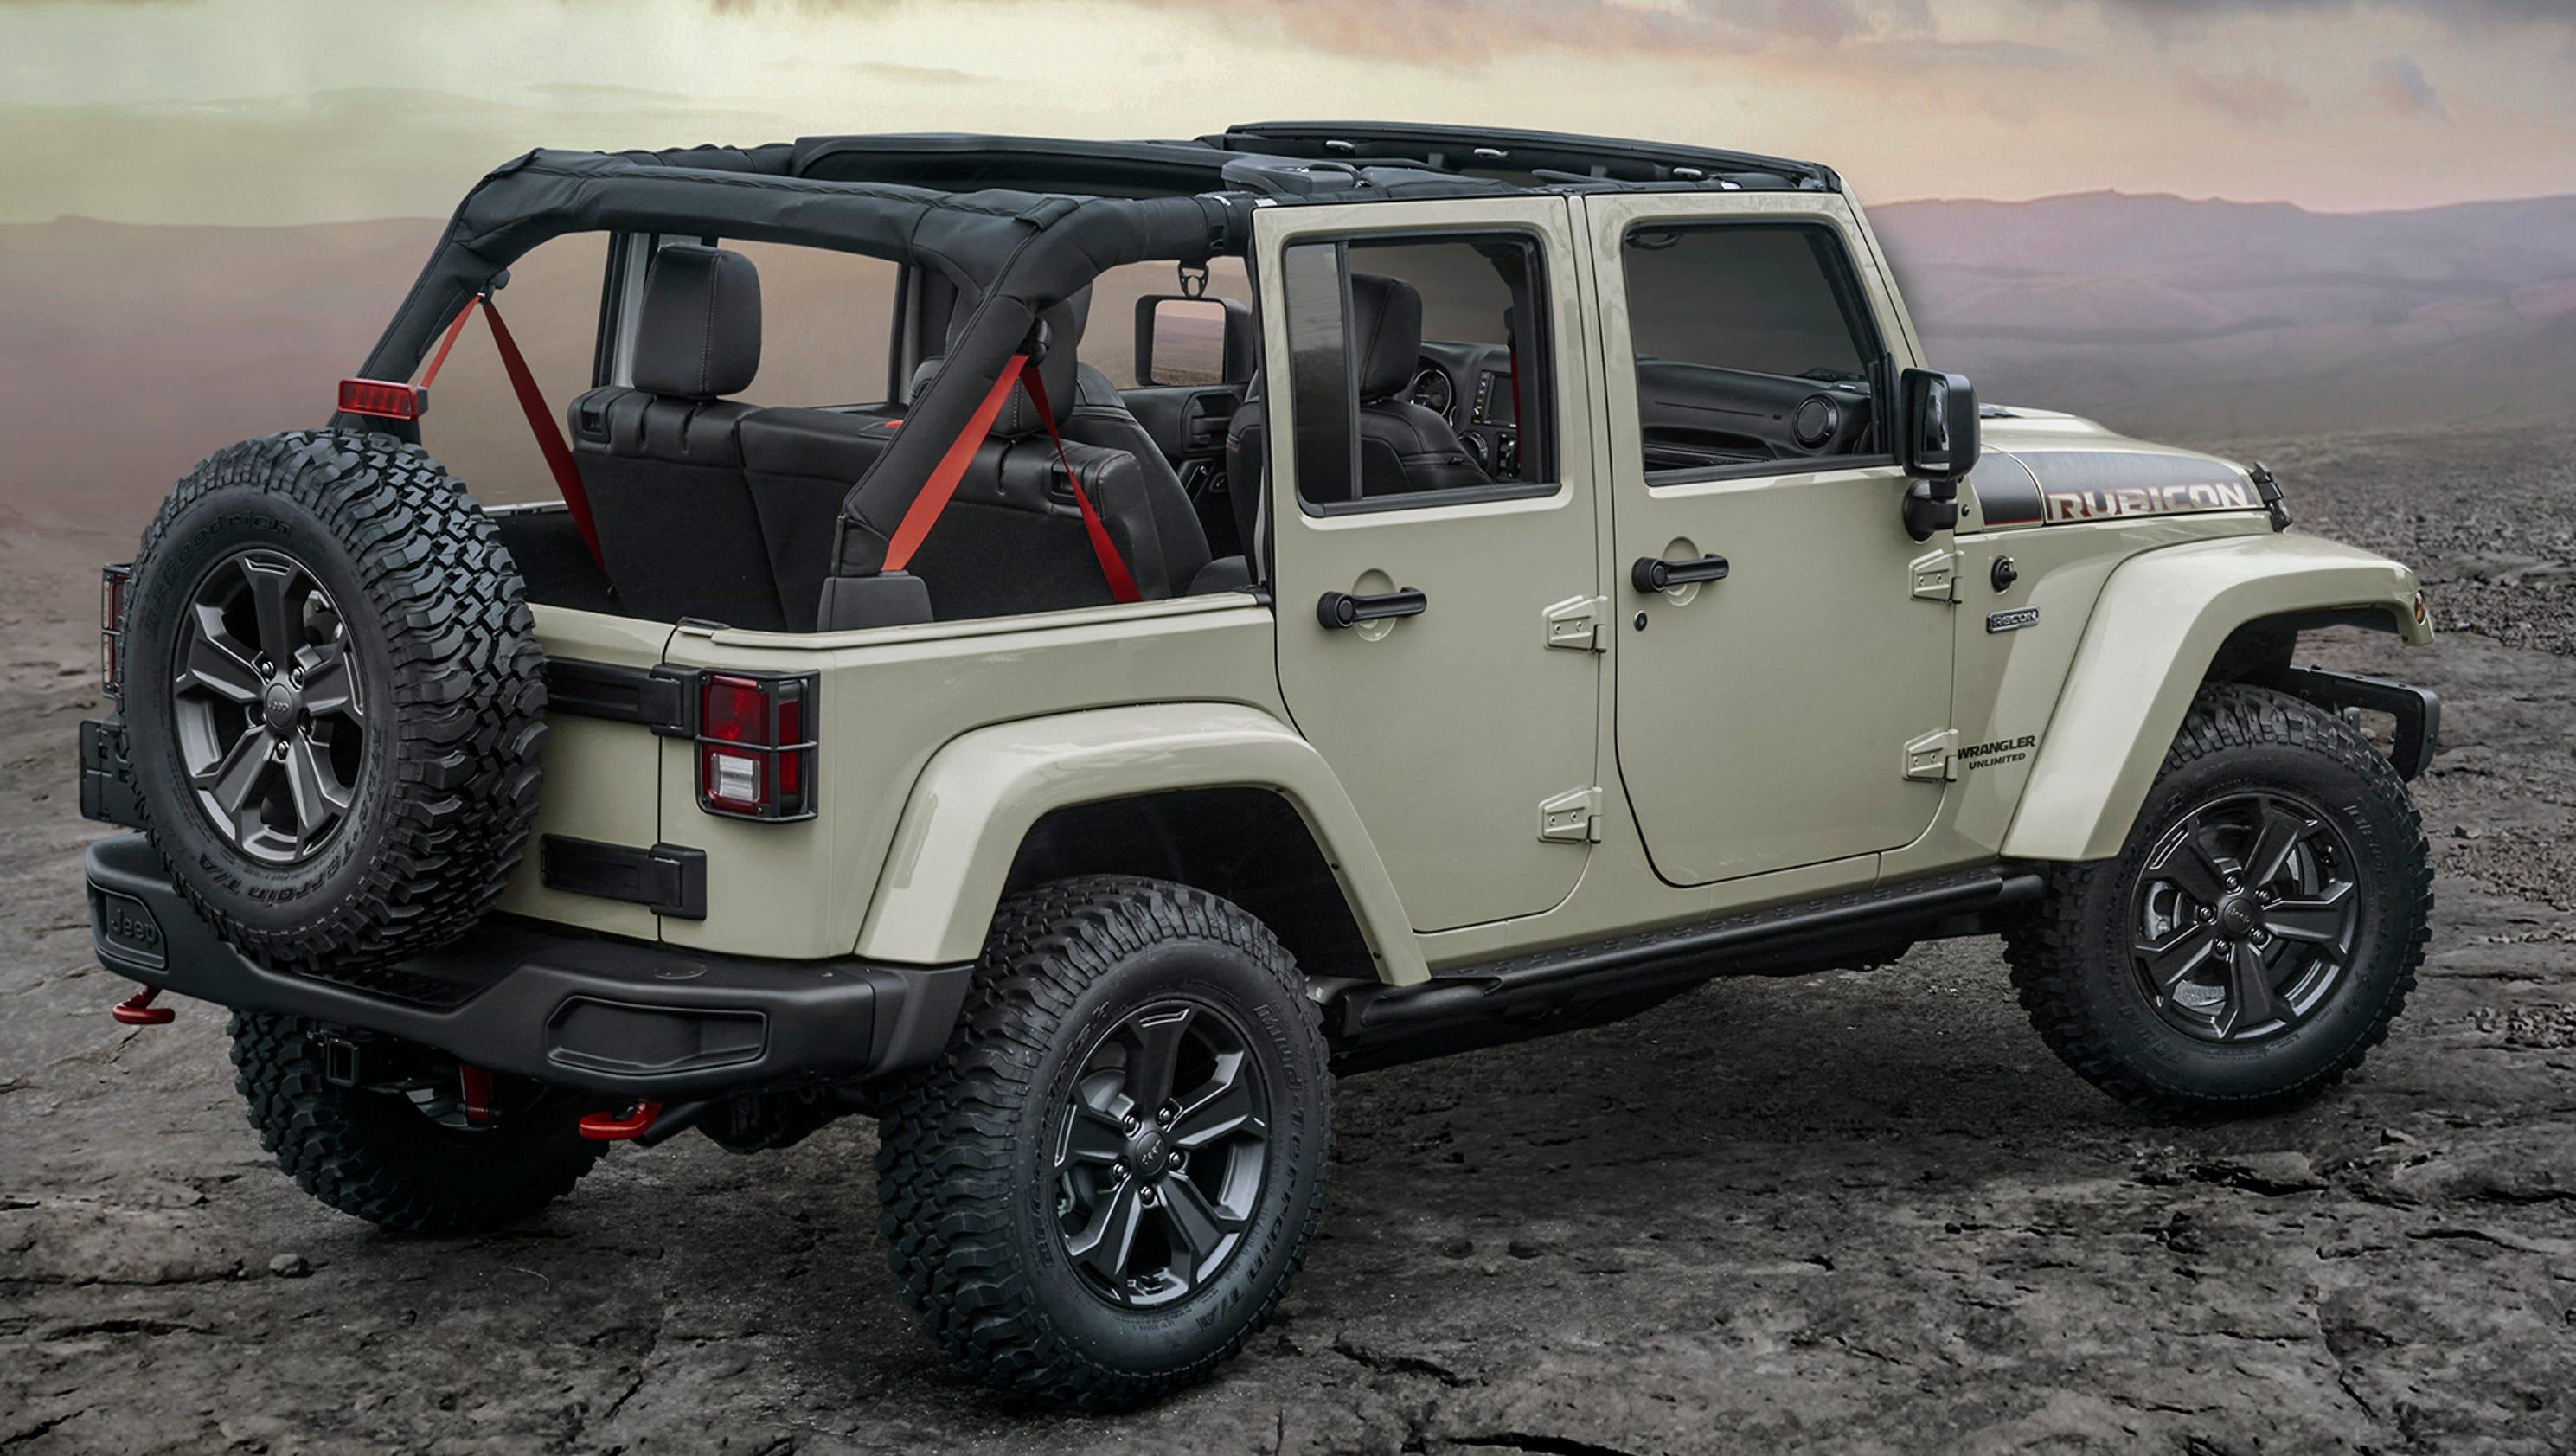 Jeep Wrangler Rubicon Recon Edition Gets A Makeover